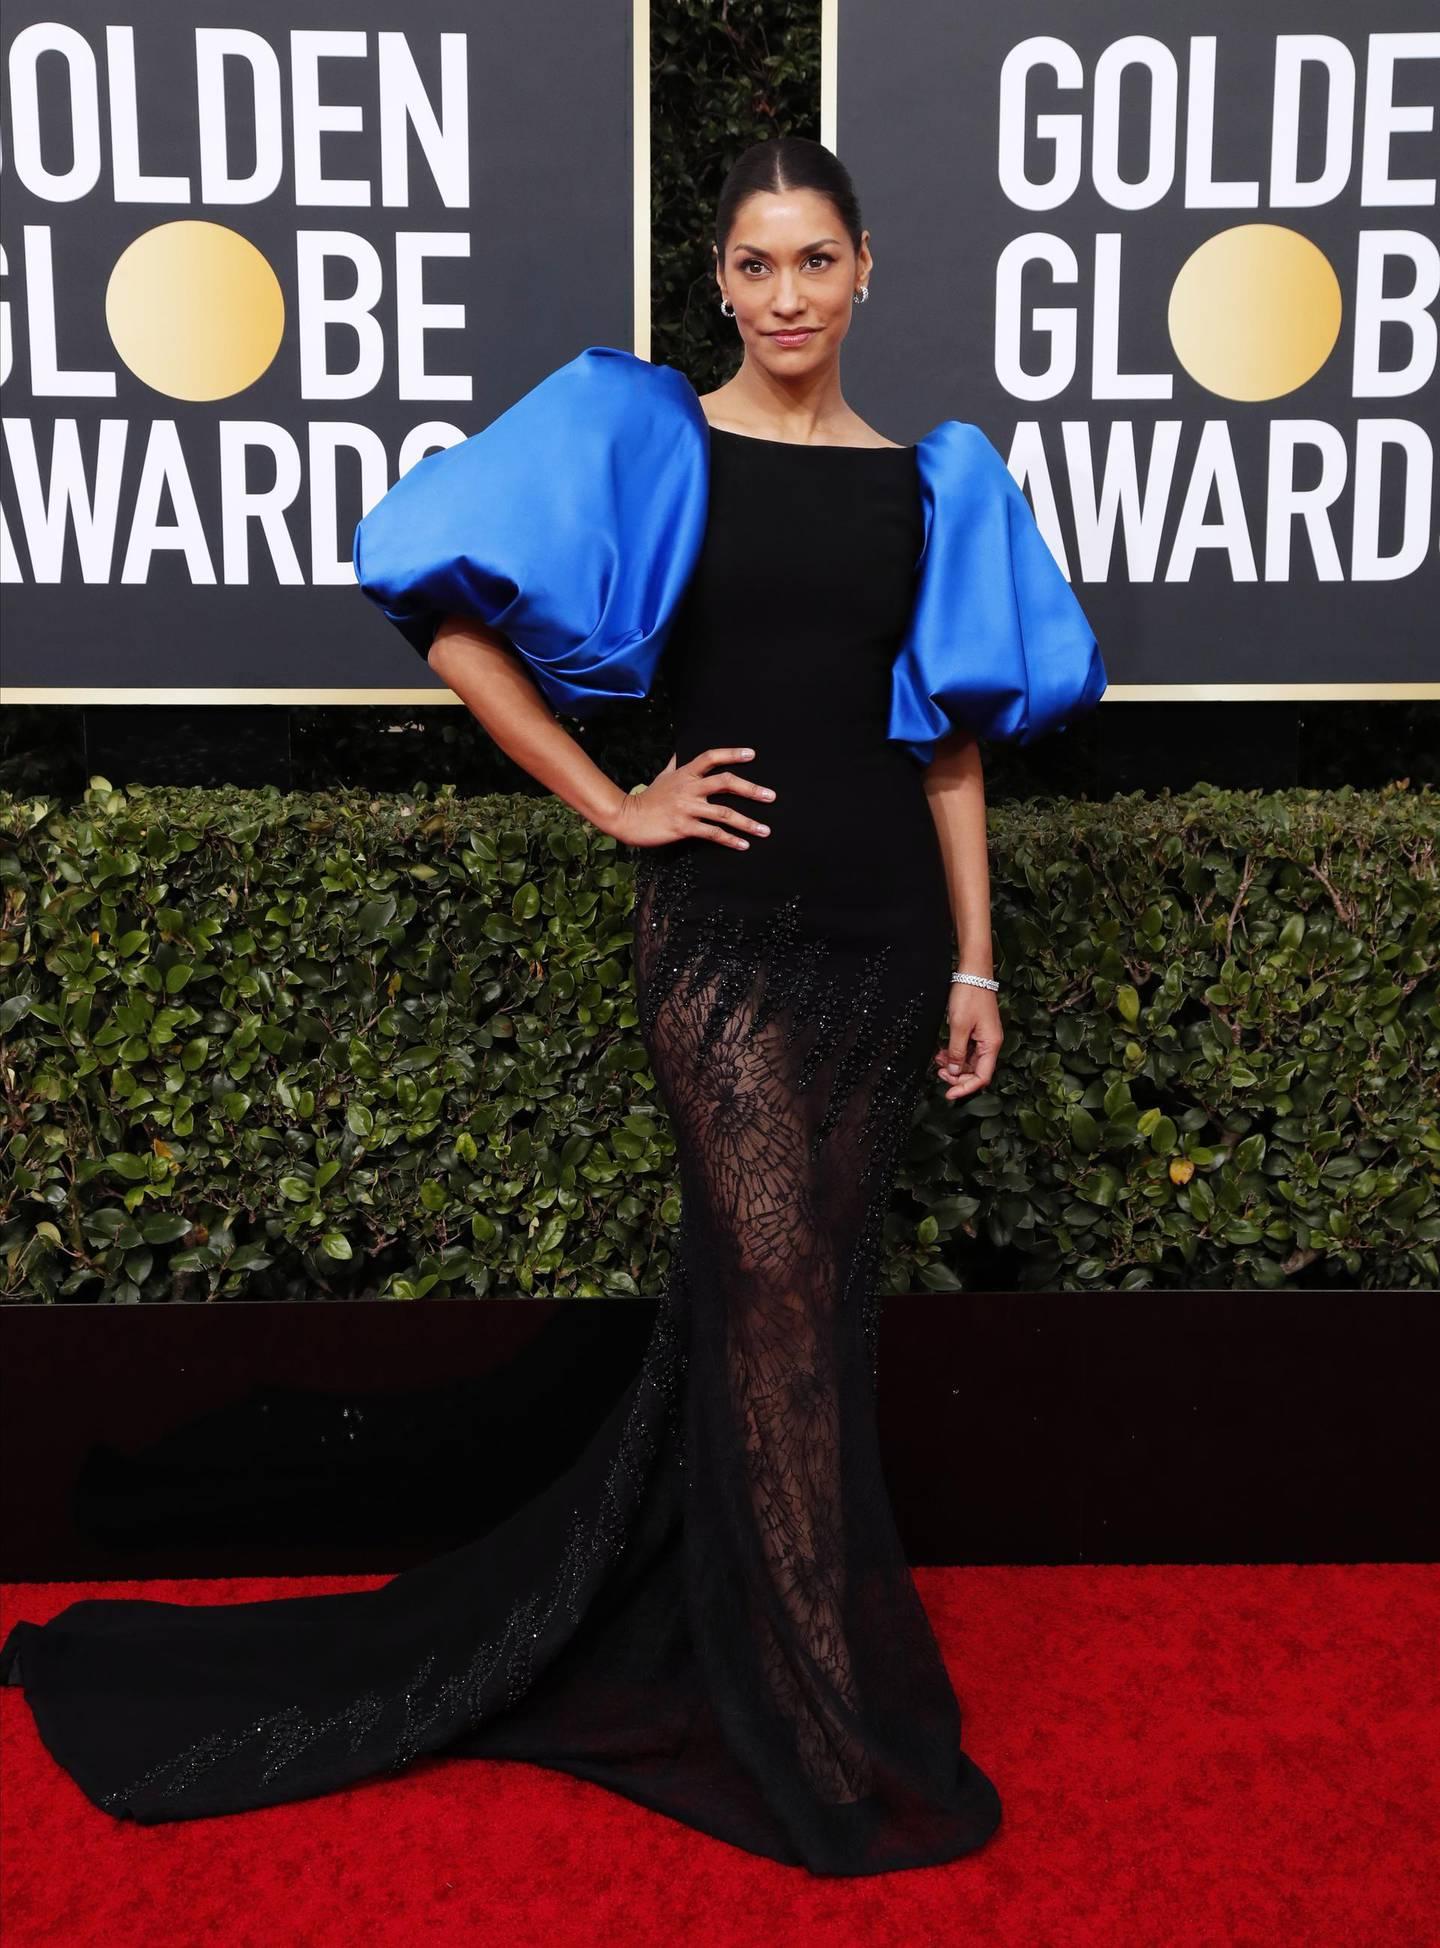 epa08105606 Janina Gavankar arrives for the 77th annual Golden Globe Awards ceremony at the Beverly Hilton Hotel, in Beverly Hills, California, USA, 05 January 2020.  EPA/NINA PROMMER